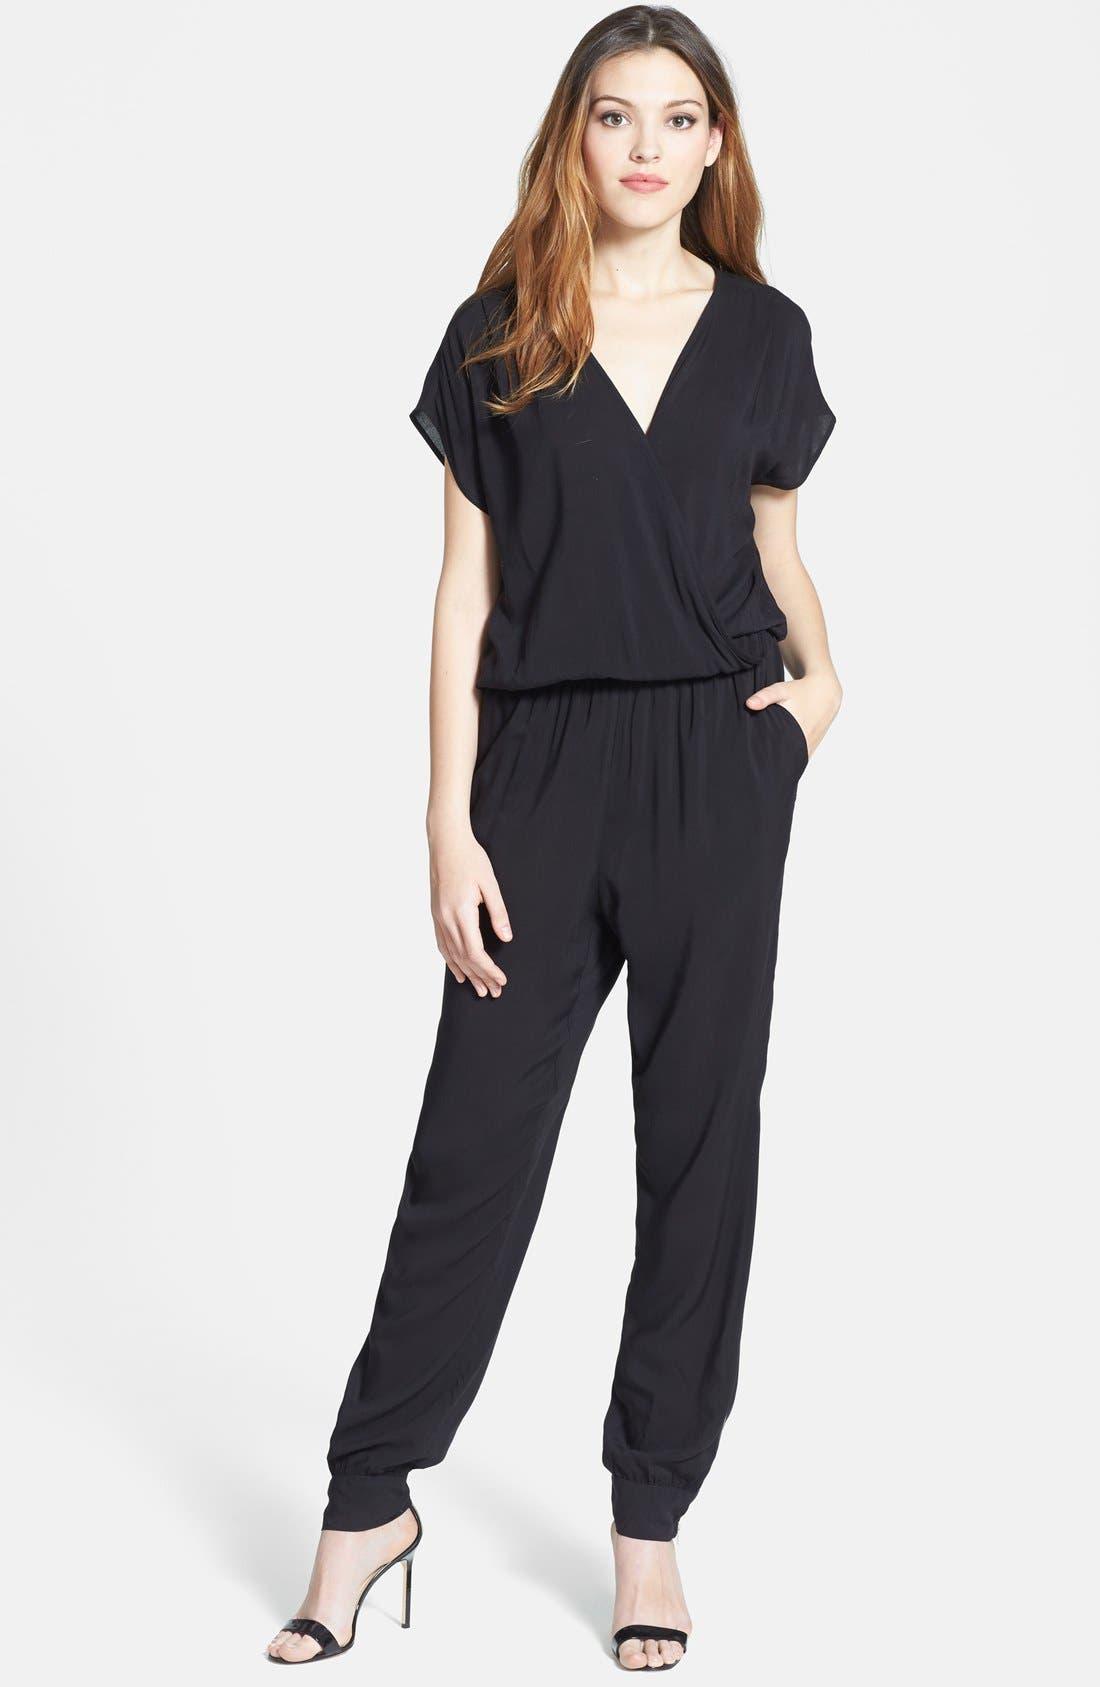 Alternate Image 1 Selected - Olivia Moon Wrap Top Jumpsuit (Regular & Petite)